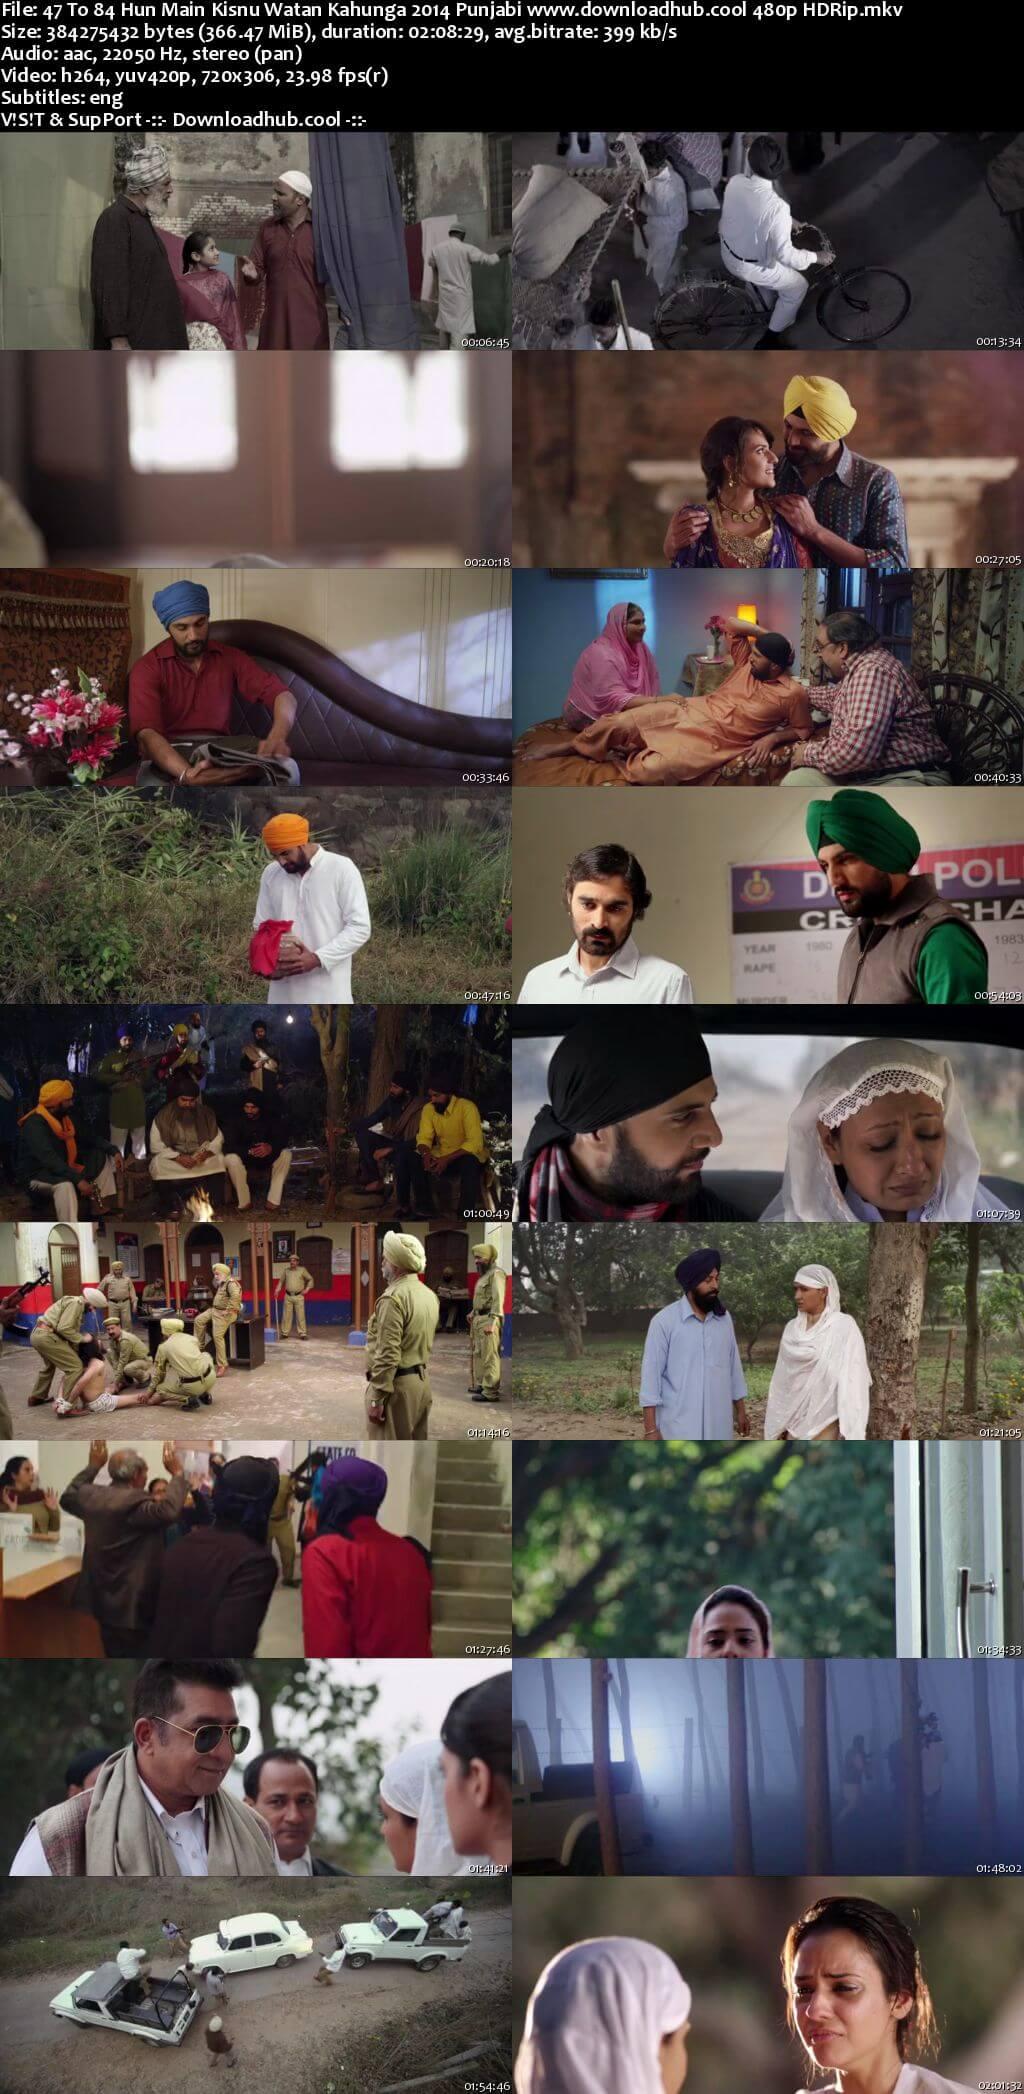 47 to 84 Hun Main Kisnu Watan Kahunga 2014 Punjabi 350MB HDRip 480p ESubs